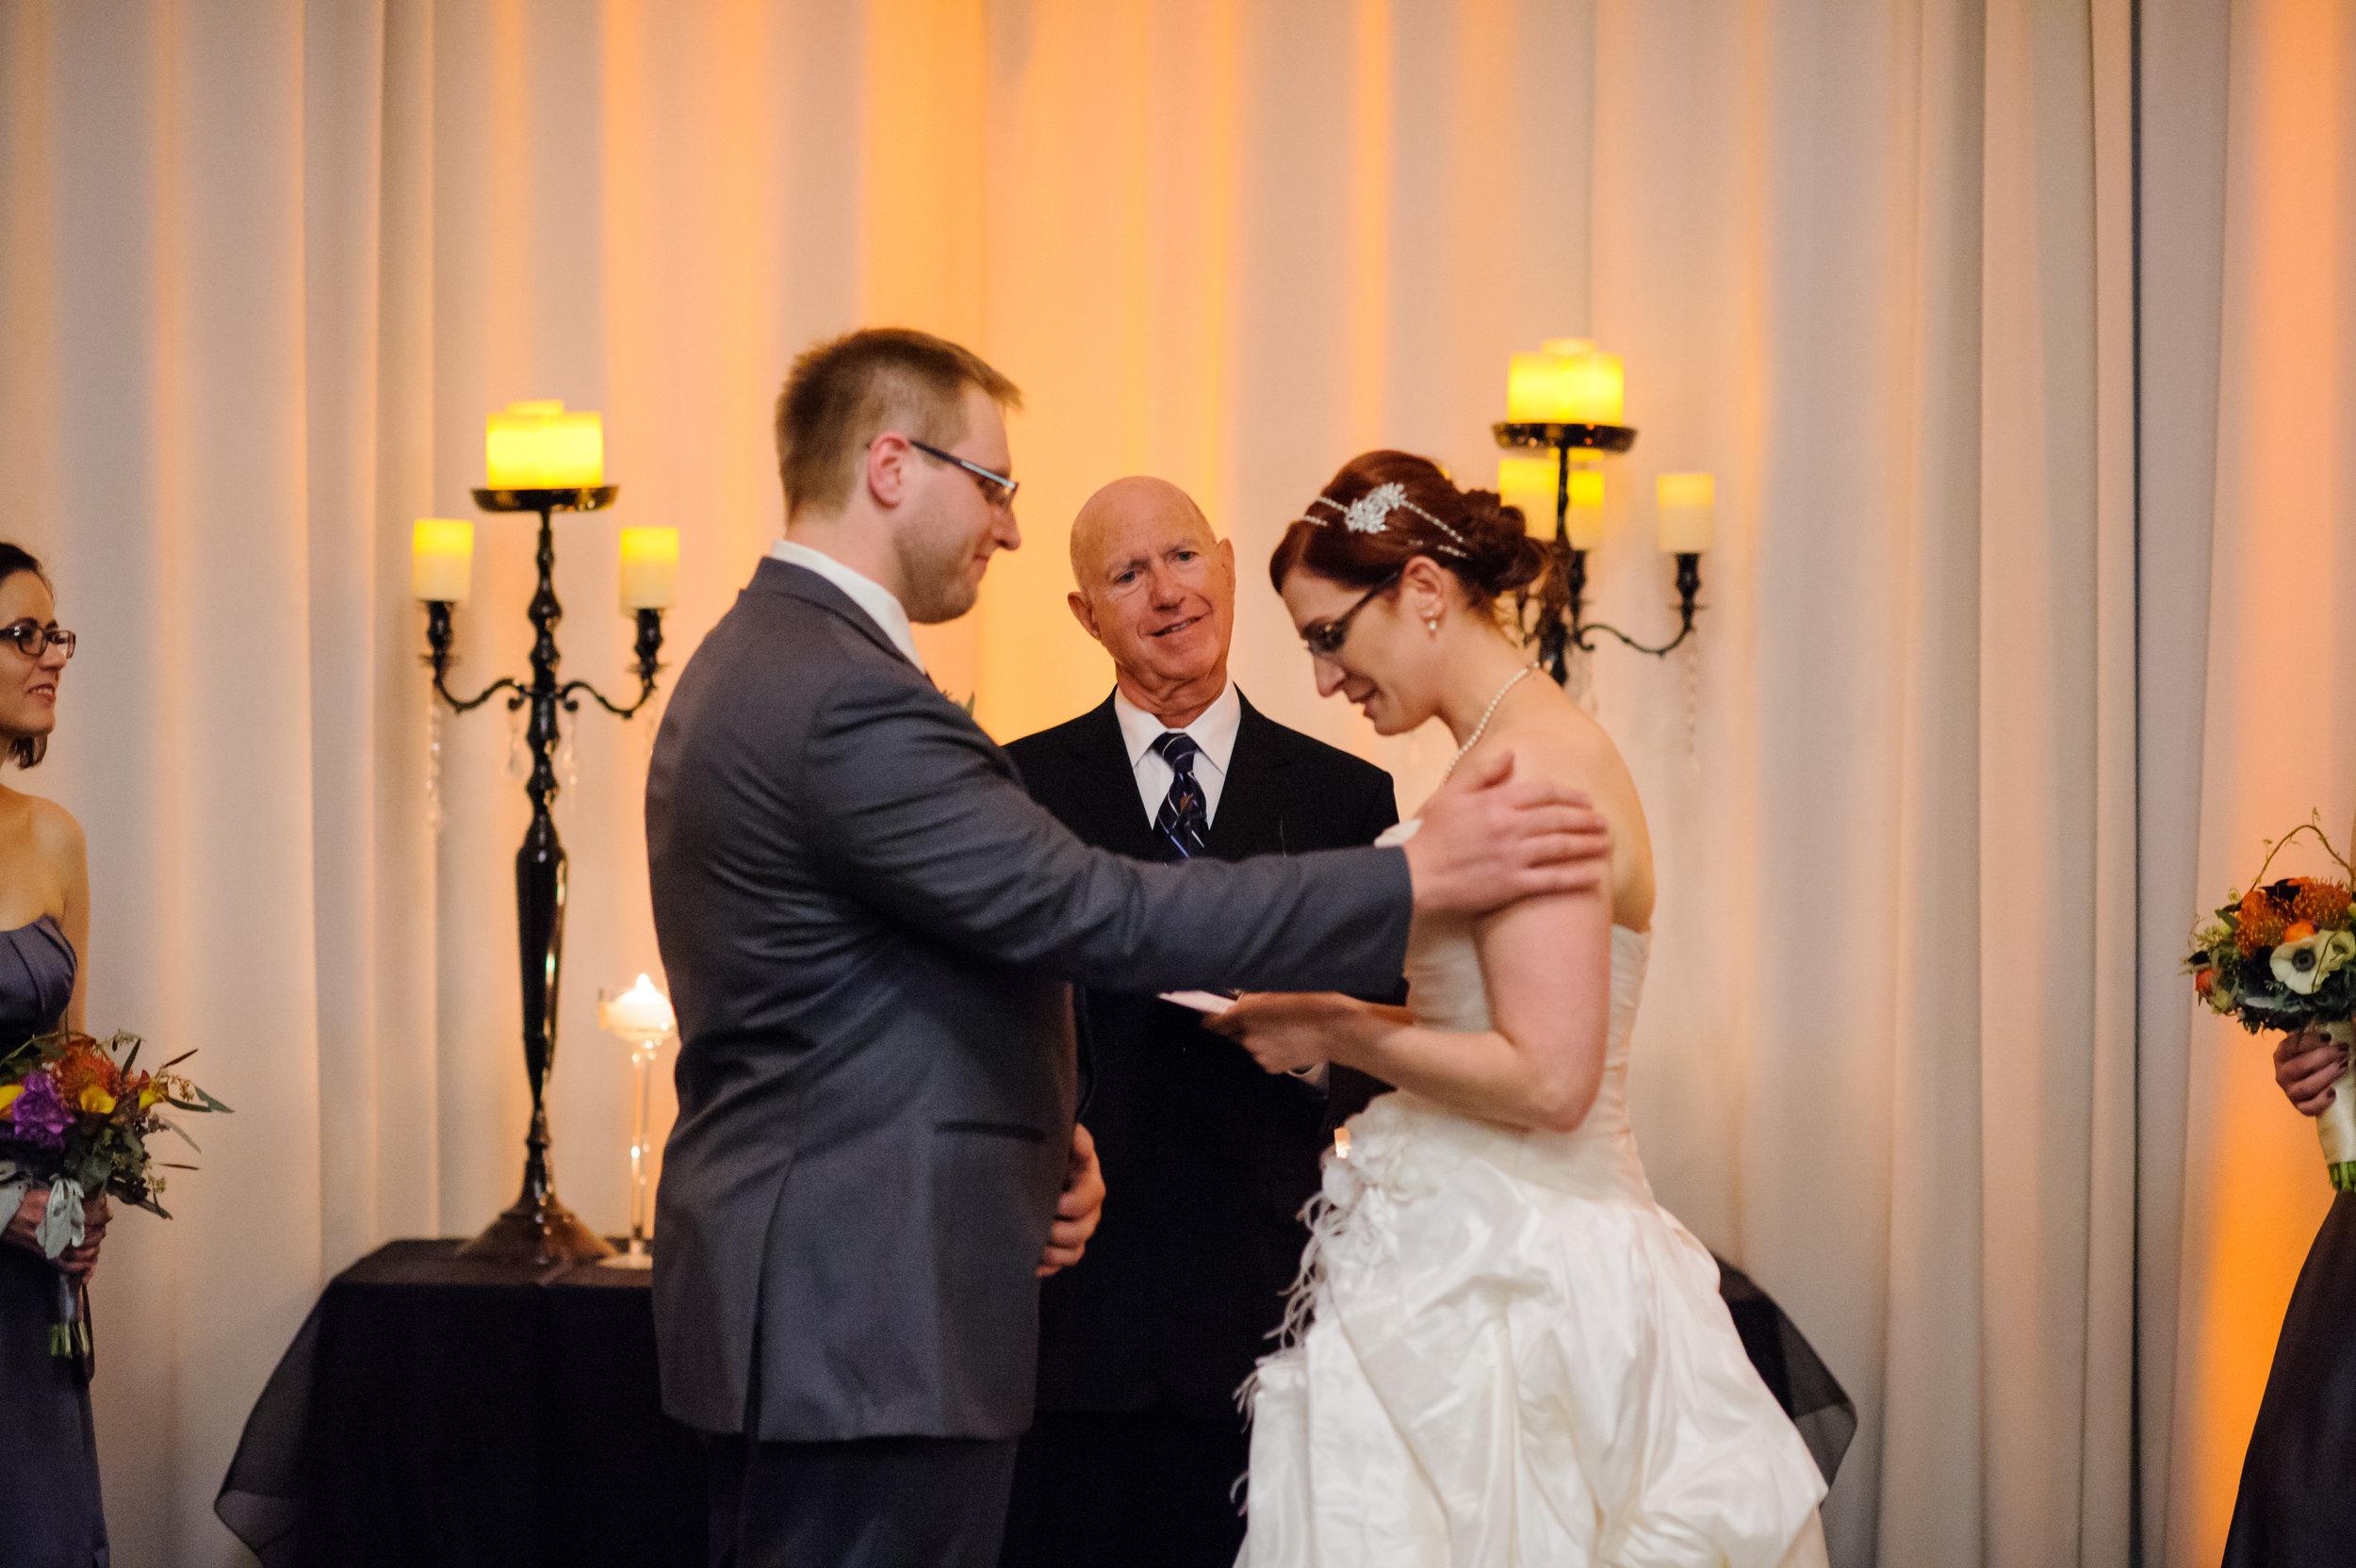 judith-john-018-citizen-hotel-sacramento-wedding-photographer-katherine-nicole-photography.JPG